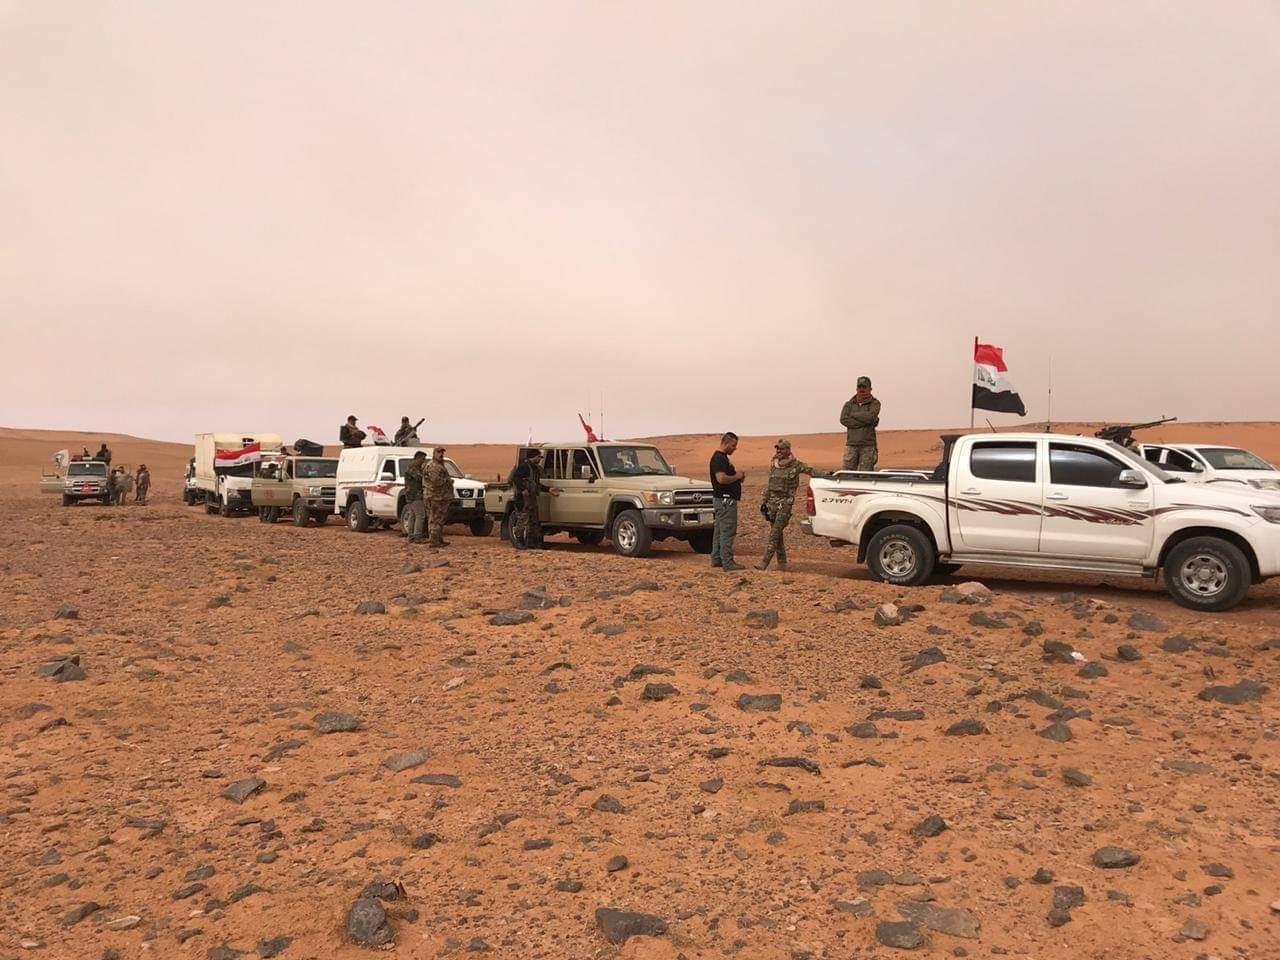 PMF destroys supplies of an ISIS gang in western Al-Anbar